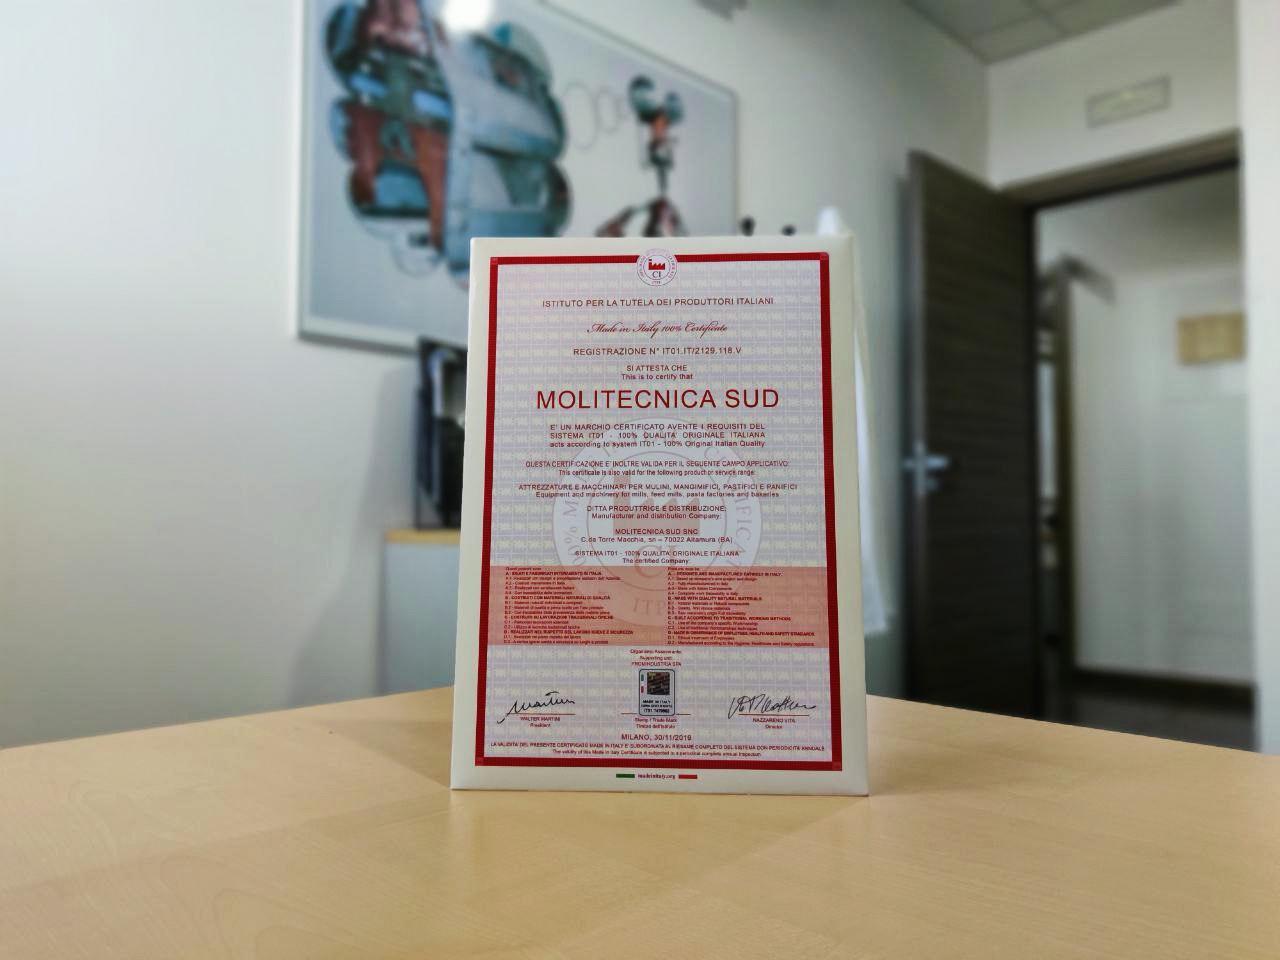 MOLITECNICA SUD CERTIFIÉE MADE IN ITALY 100%